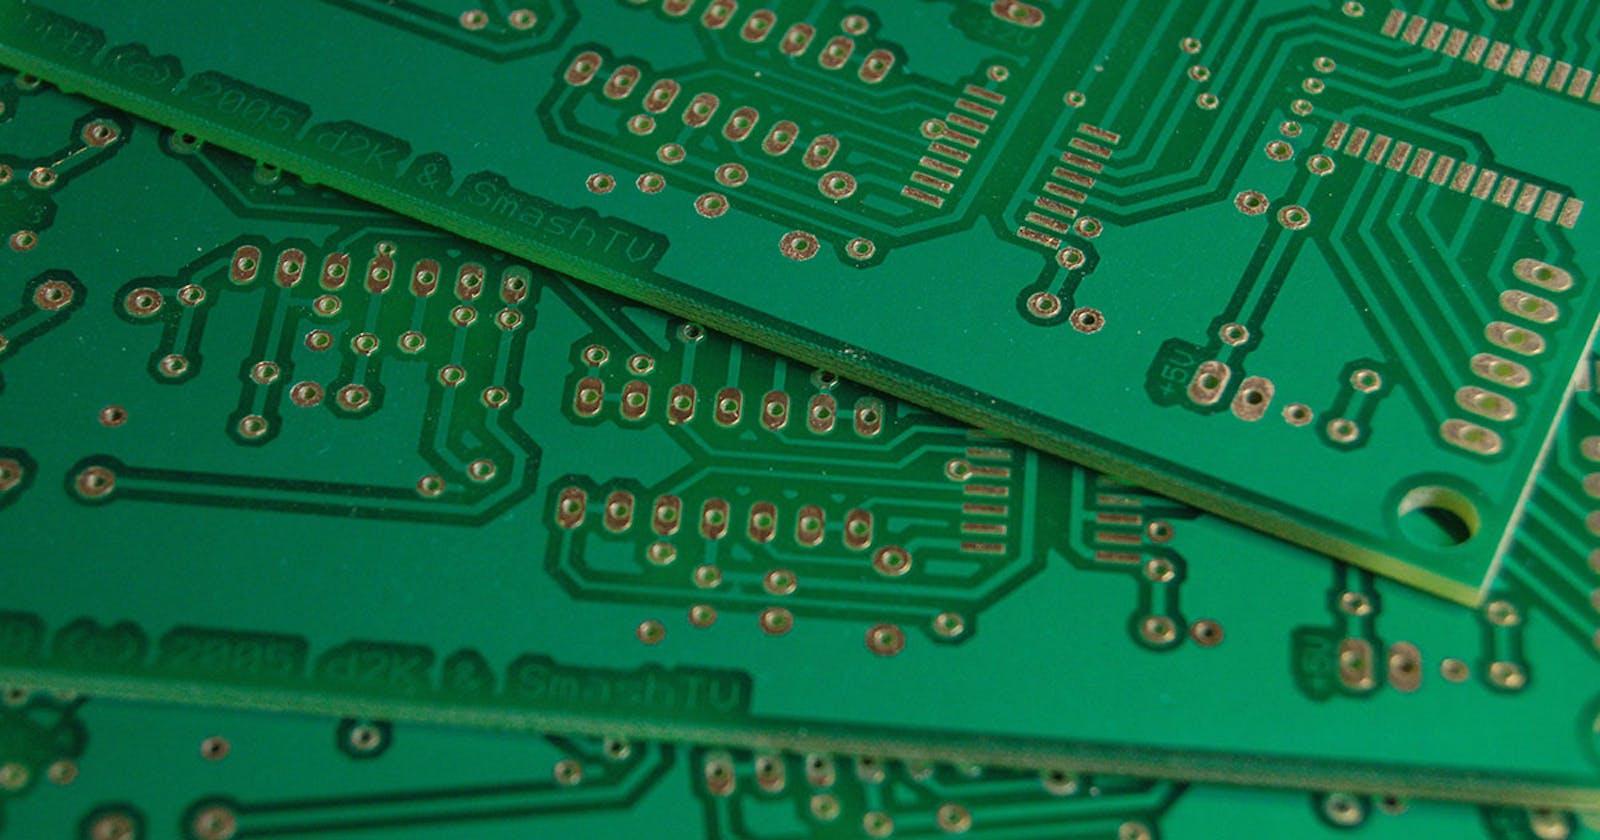 DIY PCB Board Production